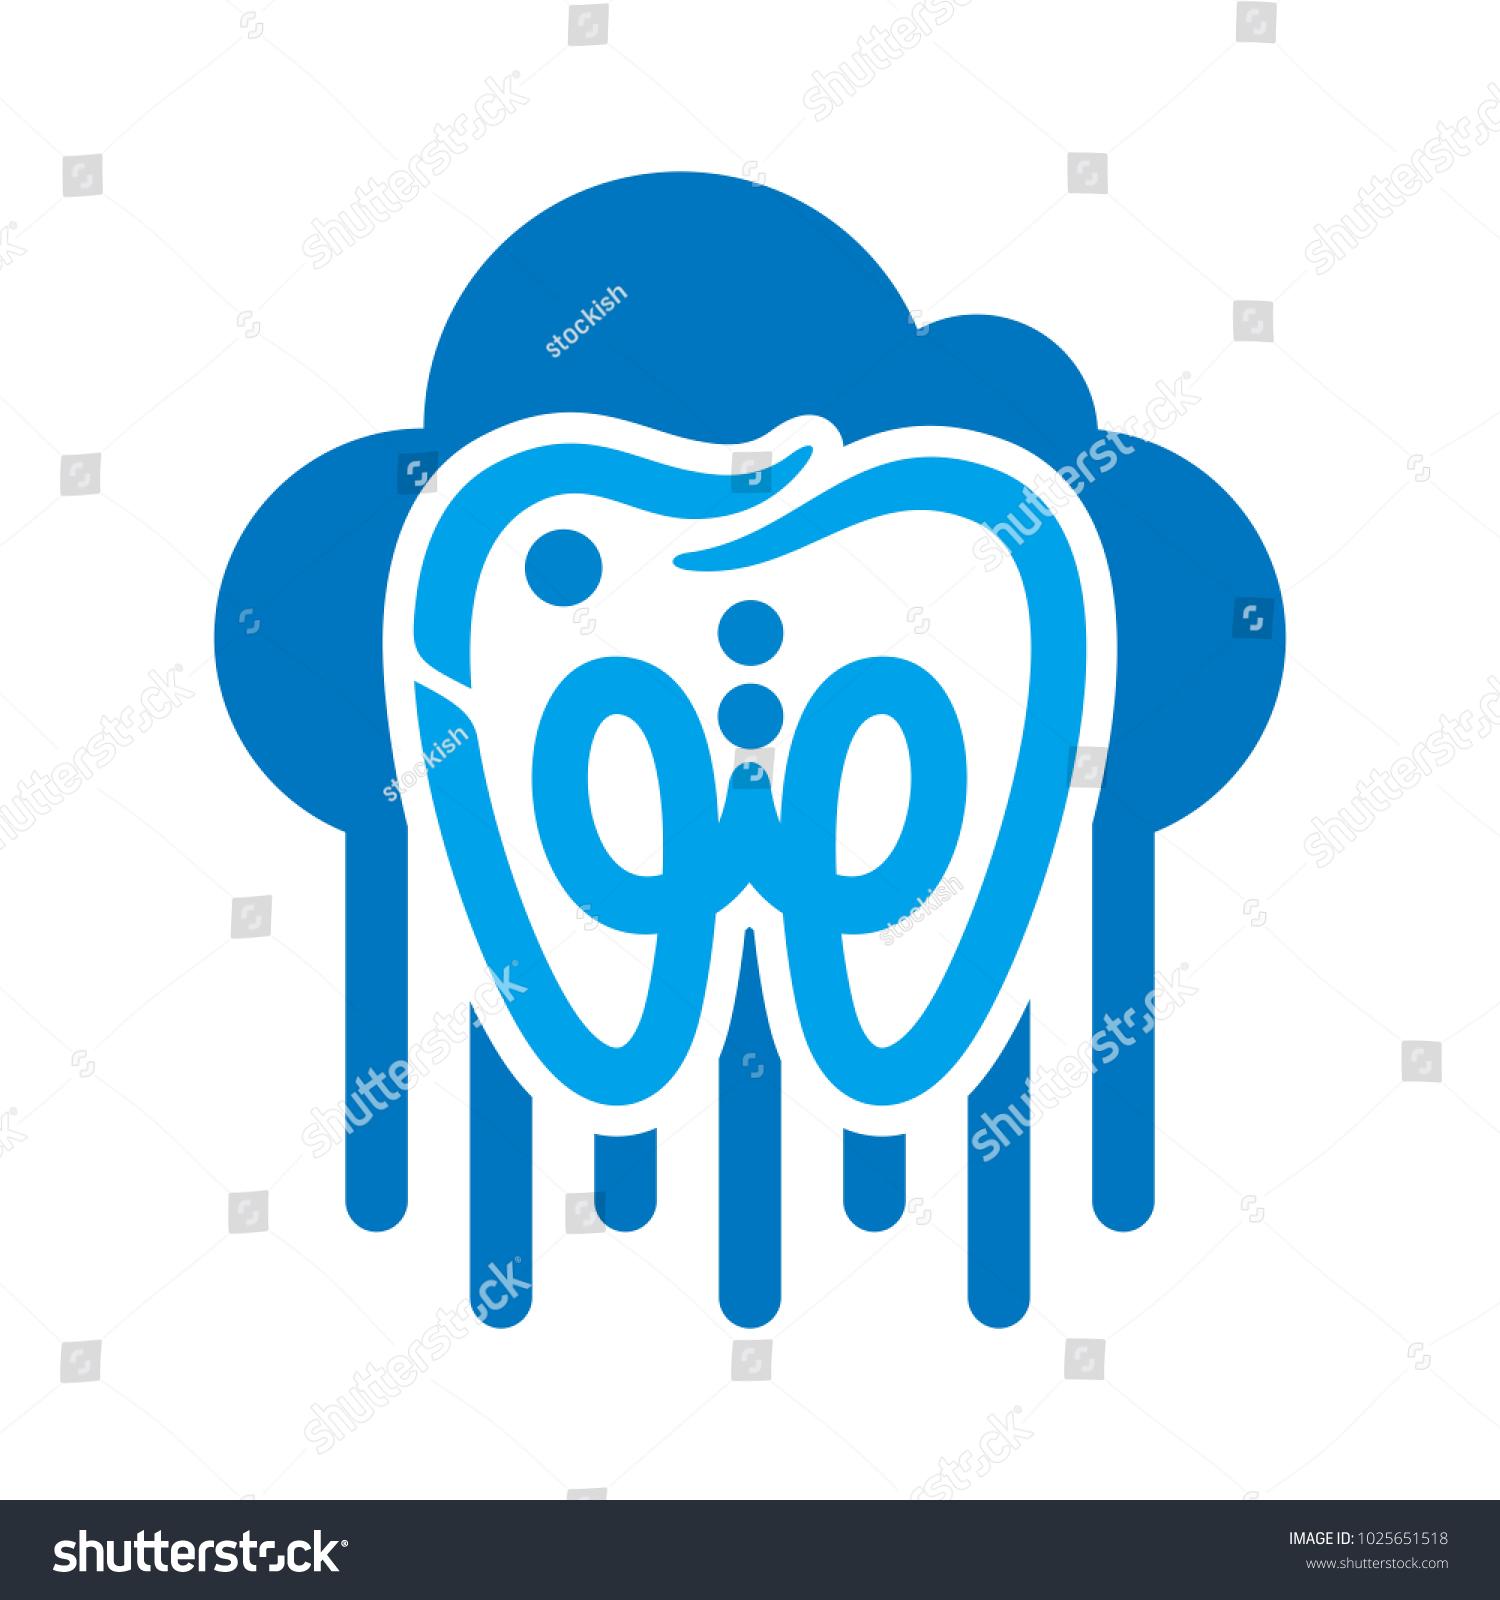 Rain cloud vector logo arabic word stock vector 1025651518 rain and cloud vector logo arabic word haton the meaning buycottarizona Image collections